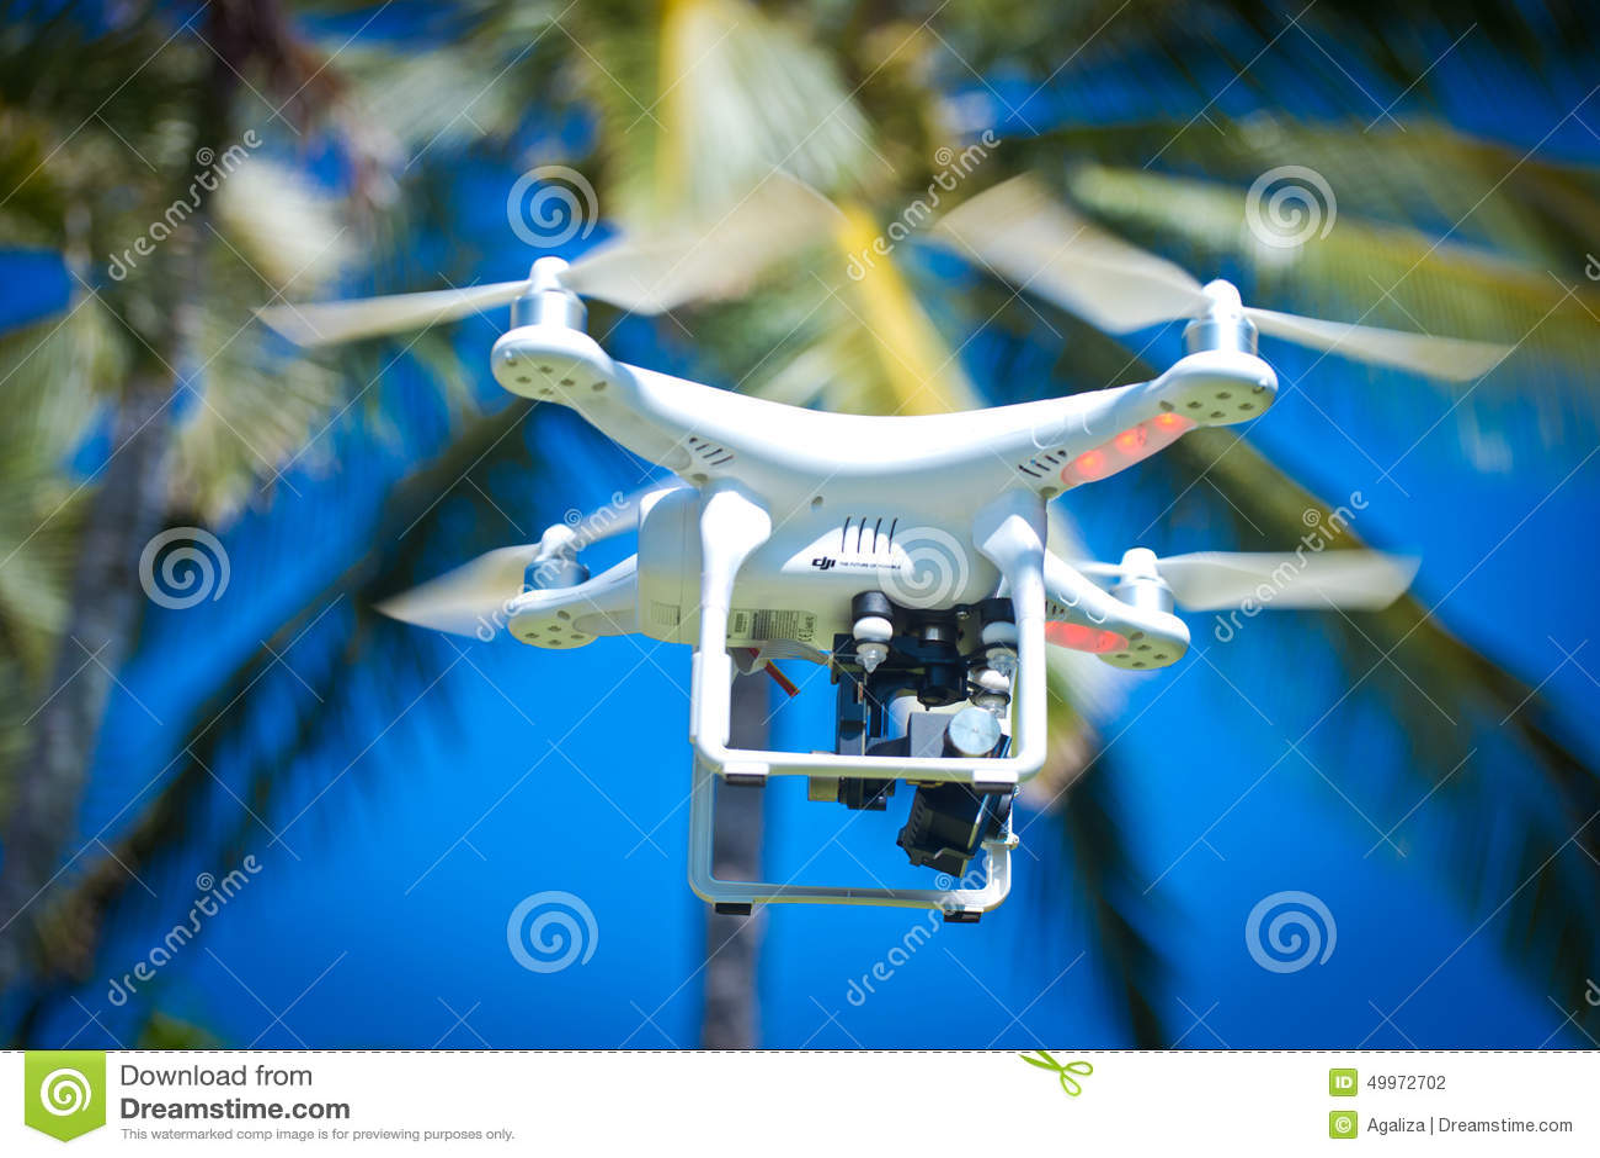 Promotion drone rennes, avis drone wifi camera